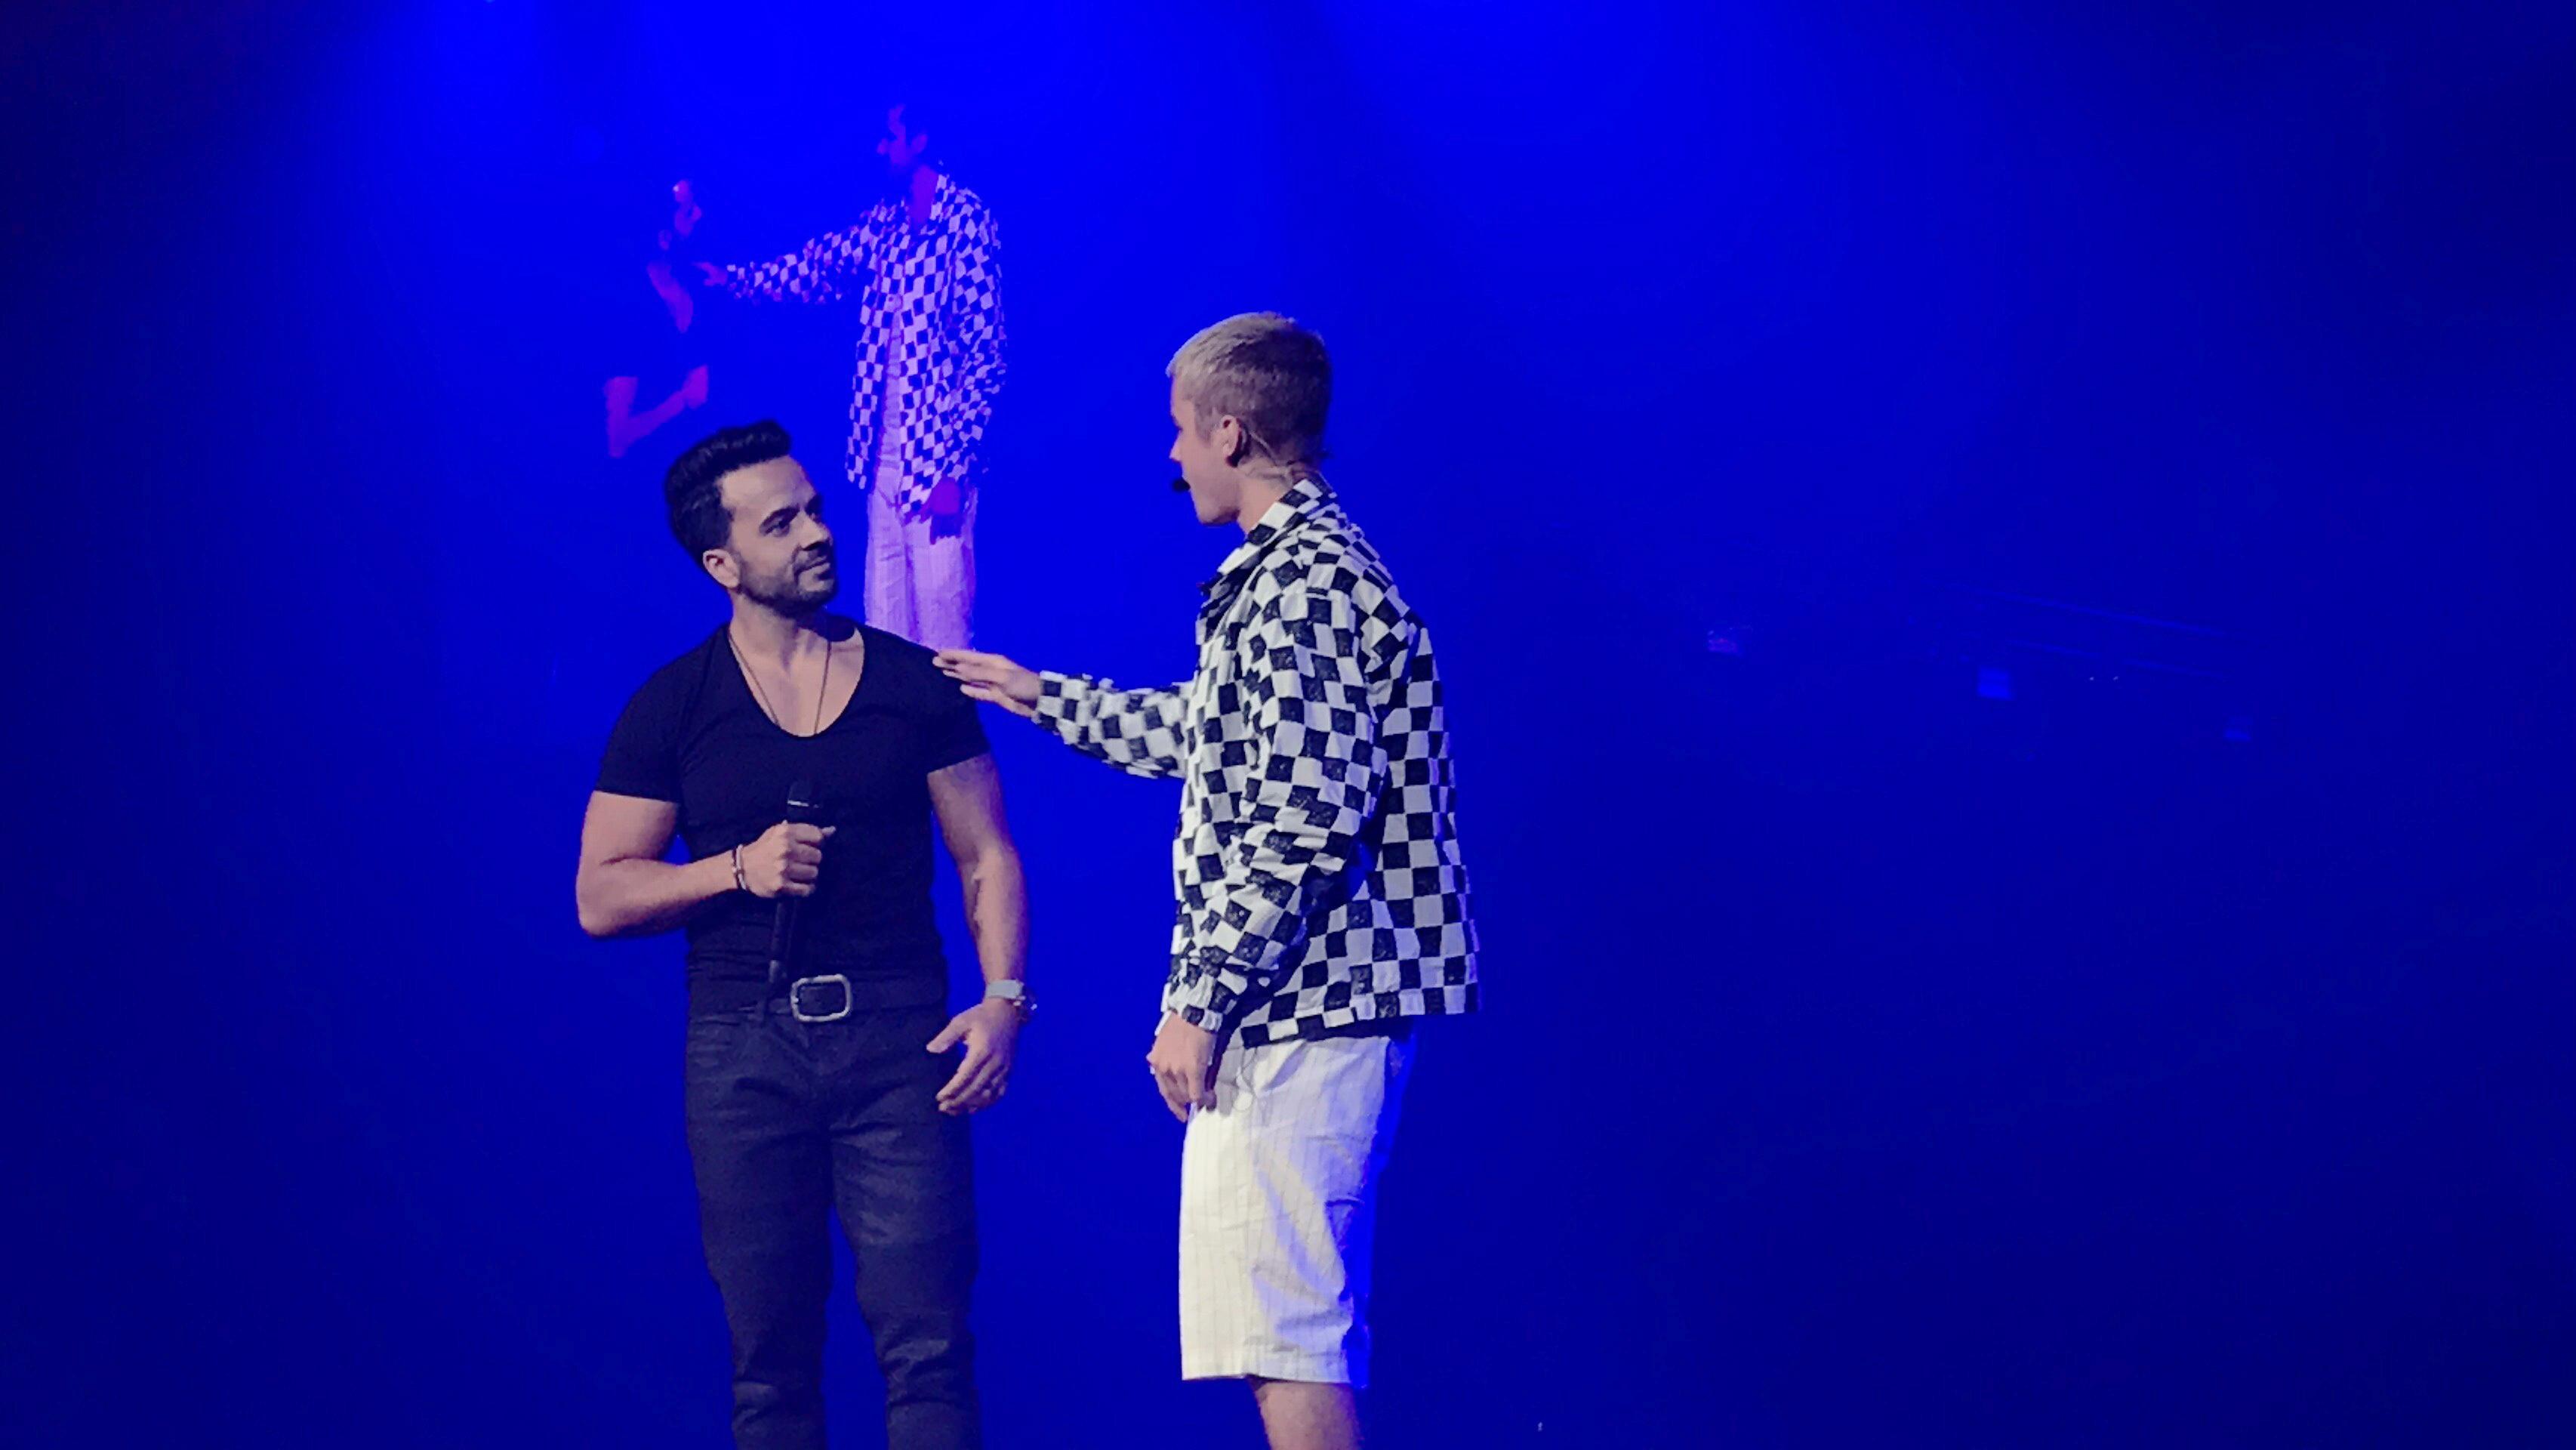 Justin-Bieber-cantando-Luis-Fonsi